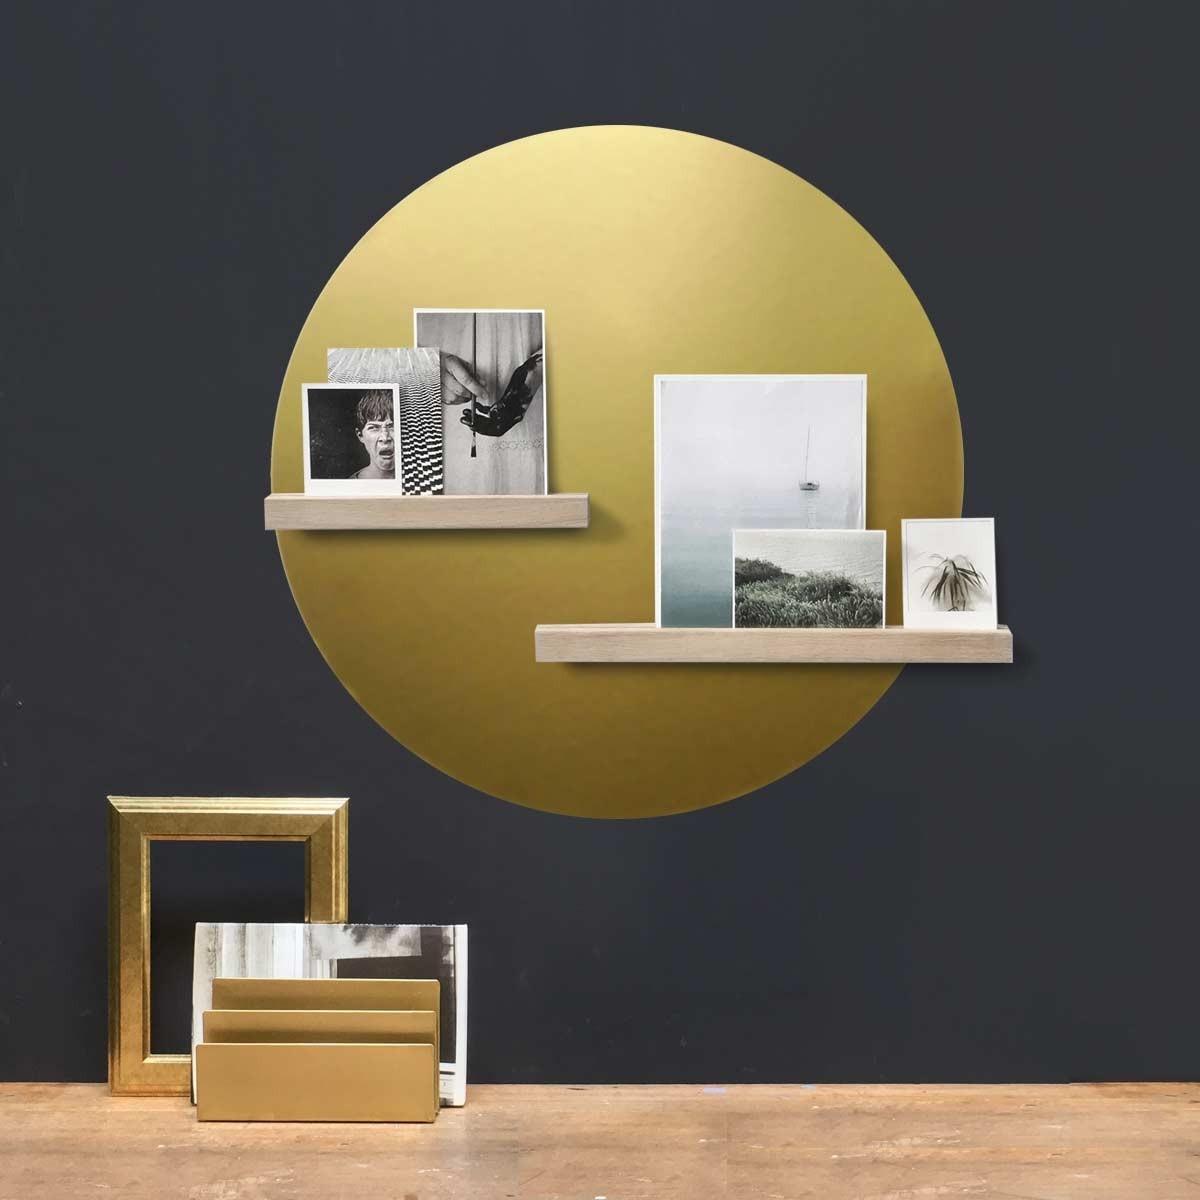 Groovy Magnets magnet sticker, round, gold